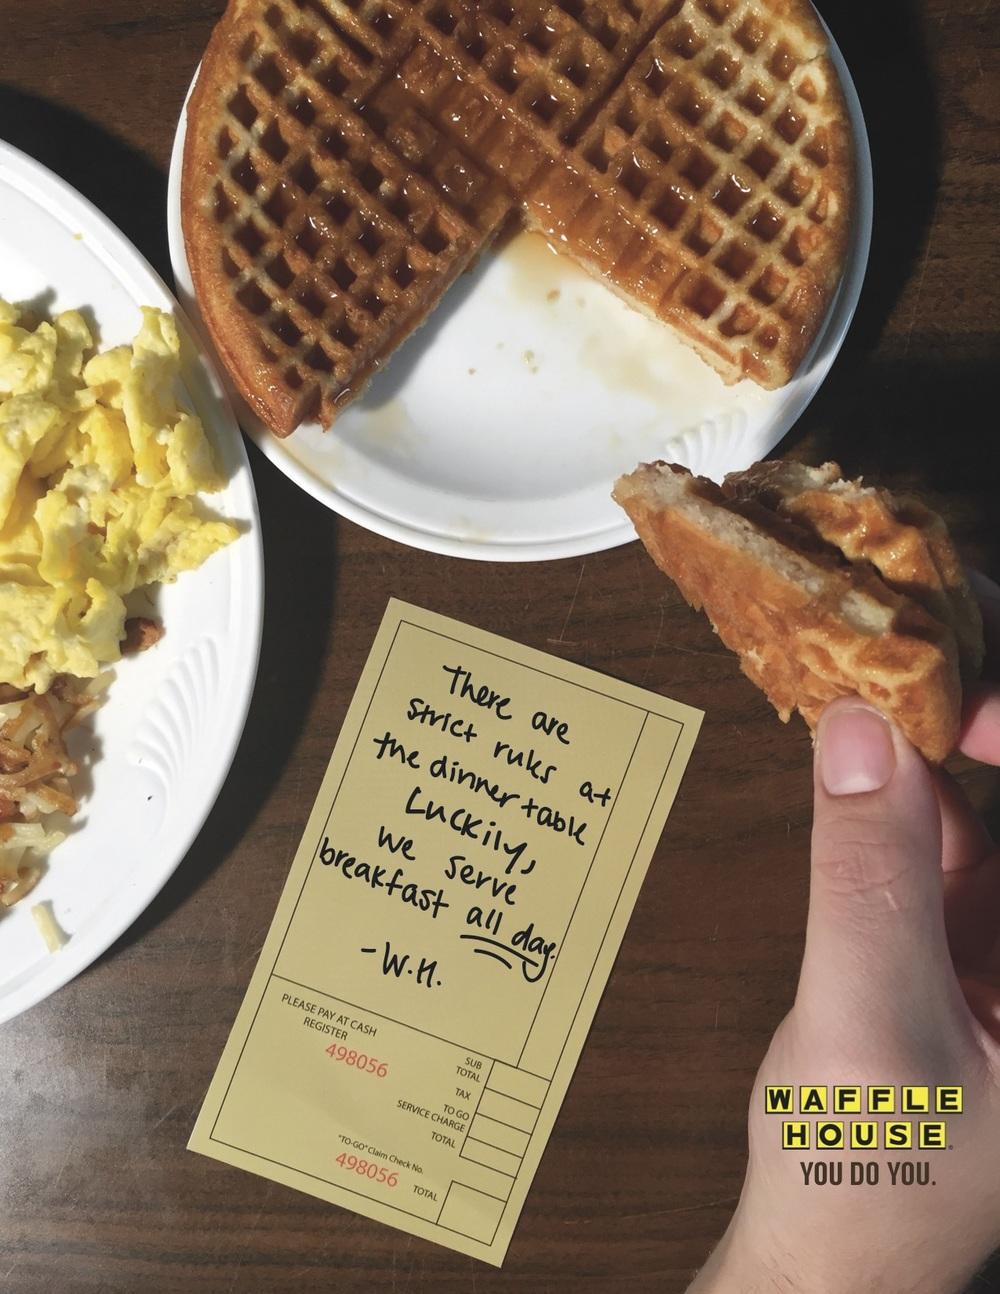 WaffleHouseStrictRules2.jpg